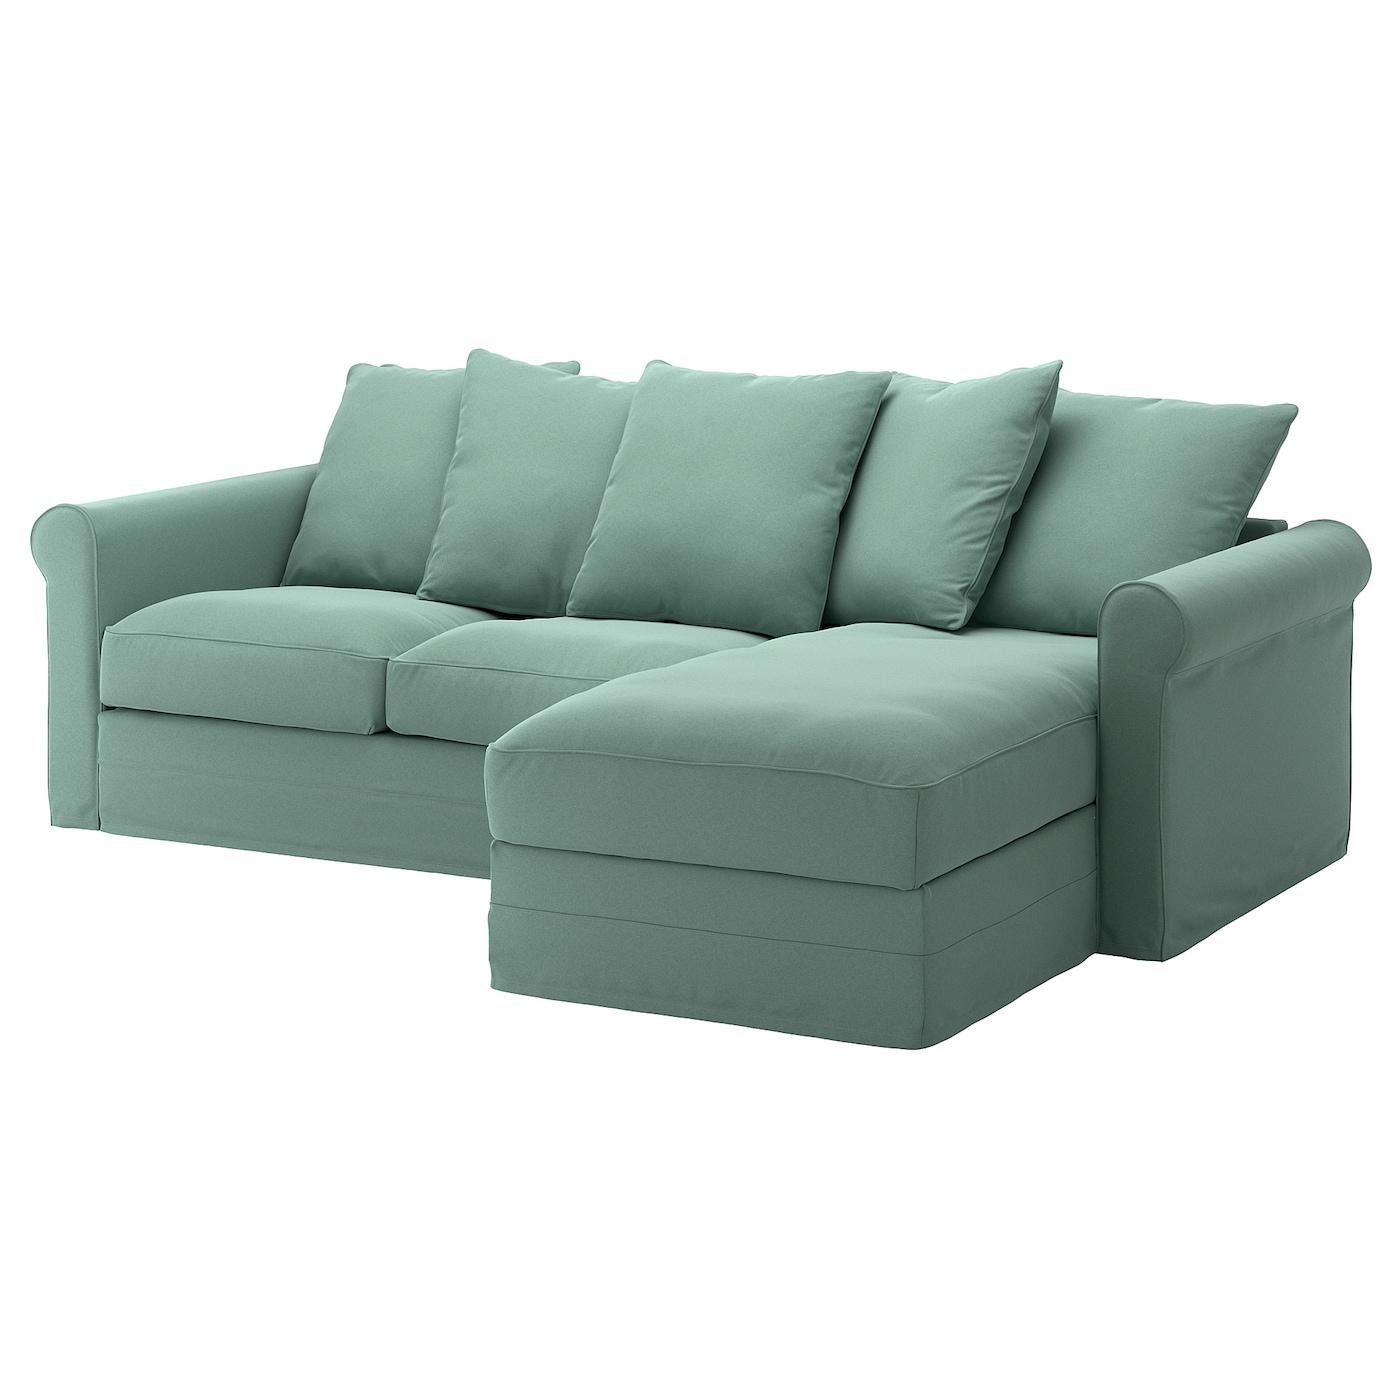 canap s fauteuils ikea. Black Bedroom Furniture Sets. Home Design Ideas